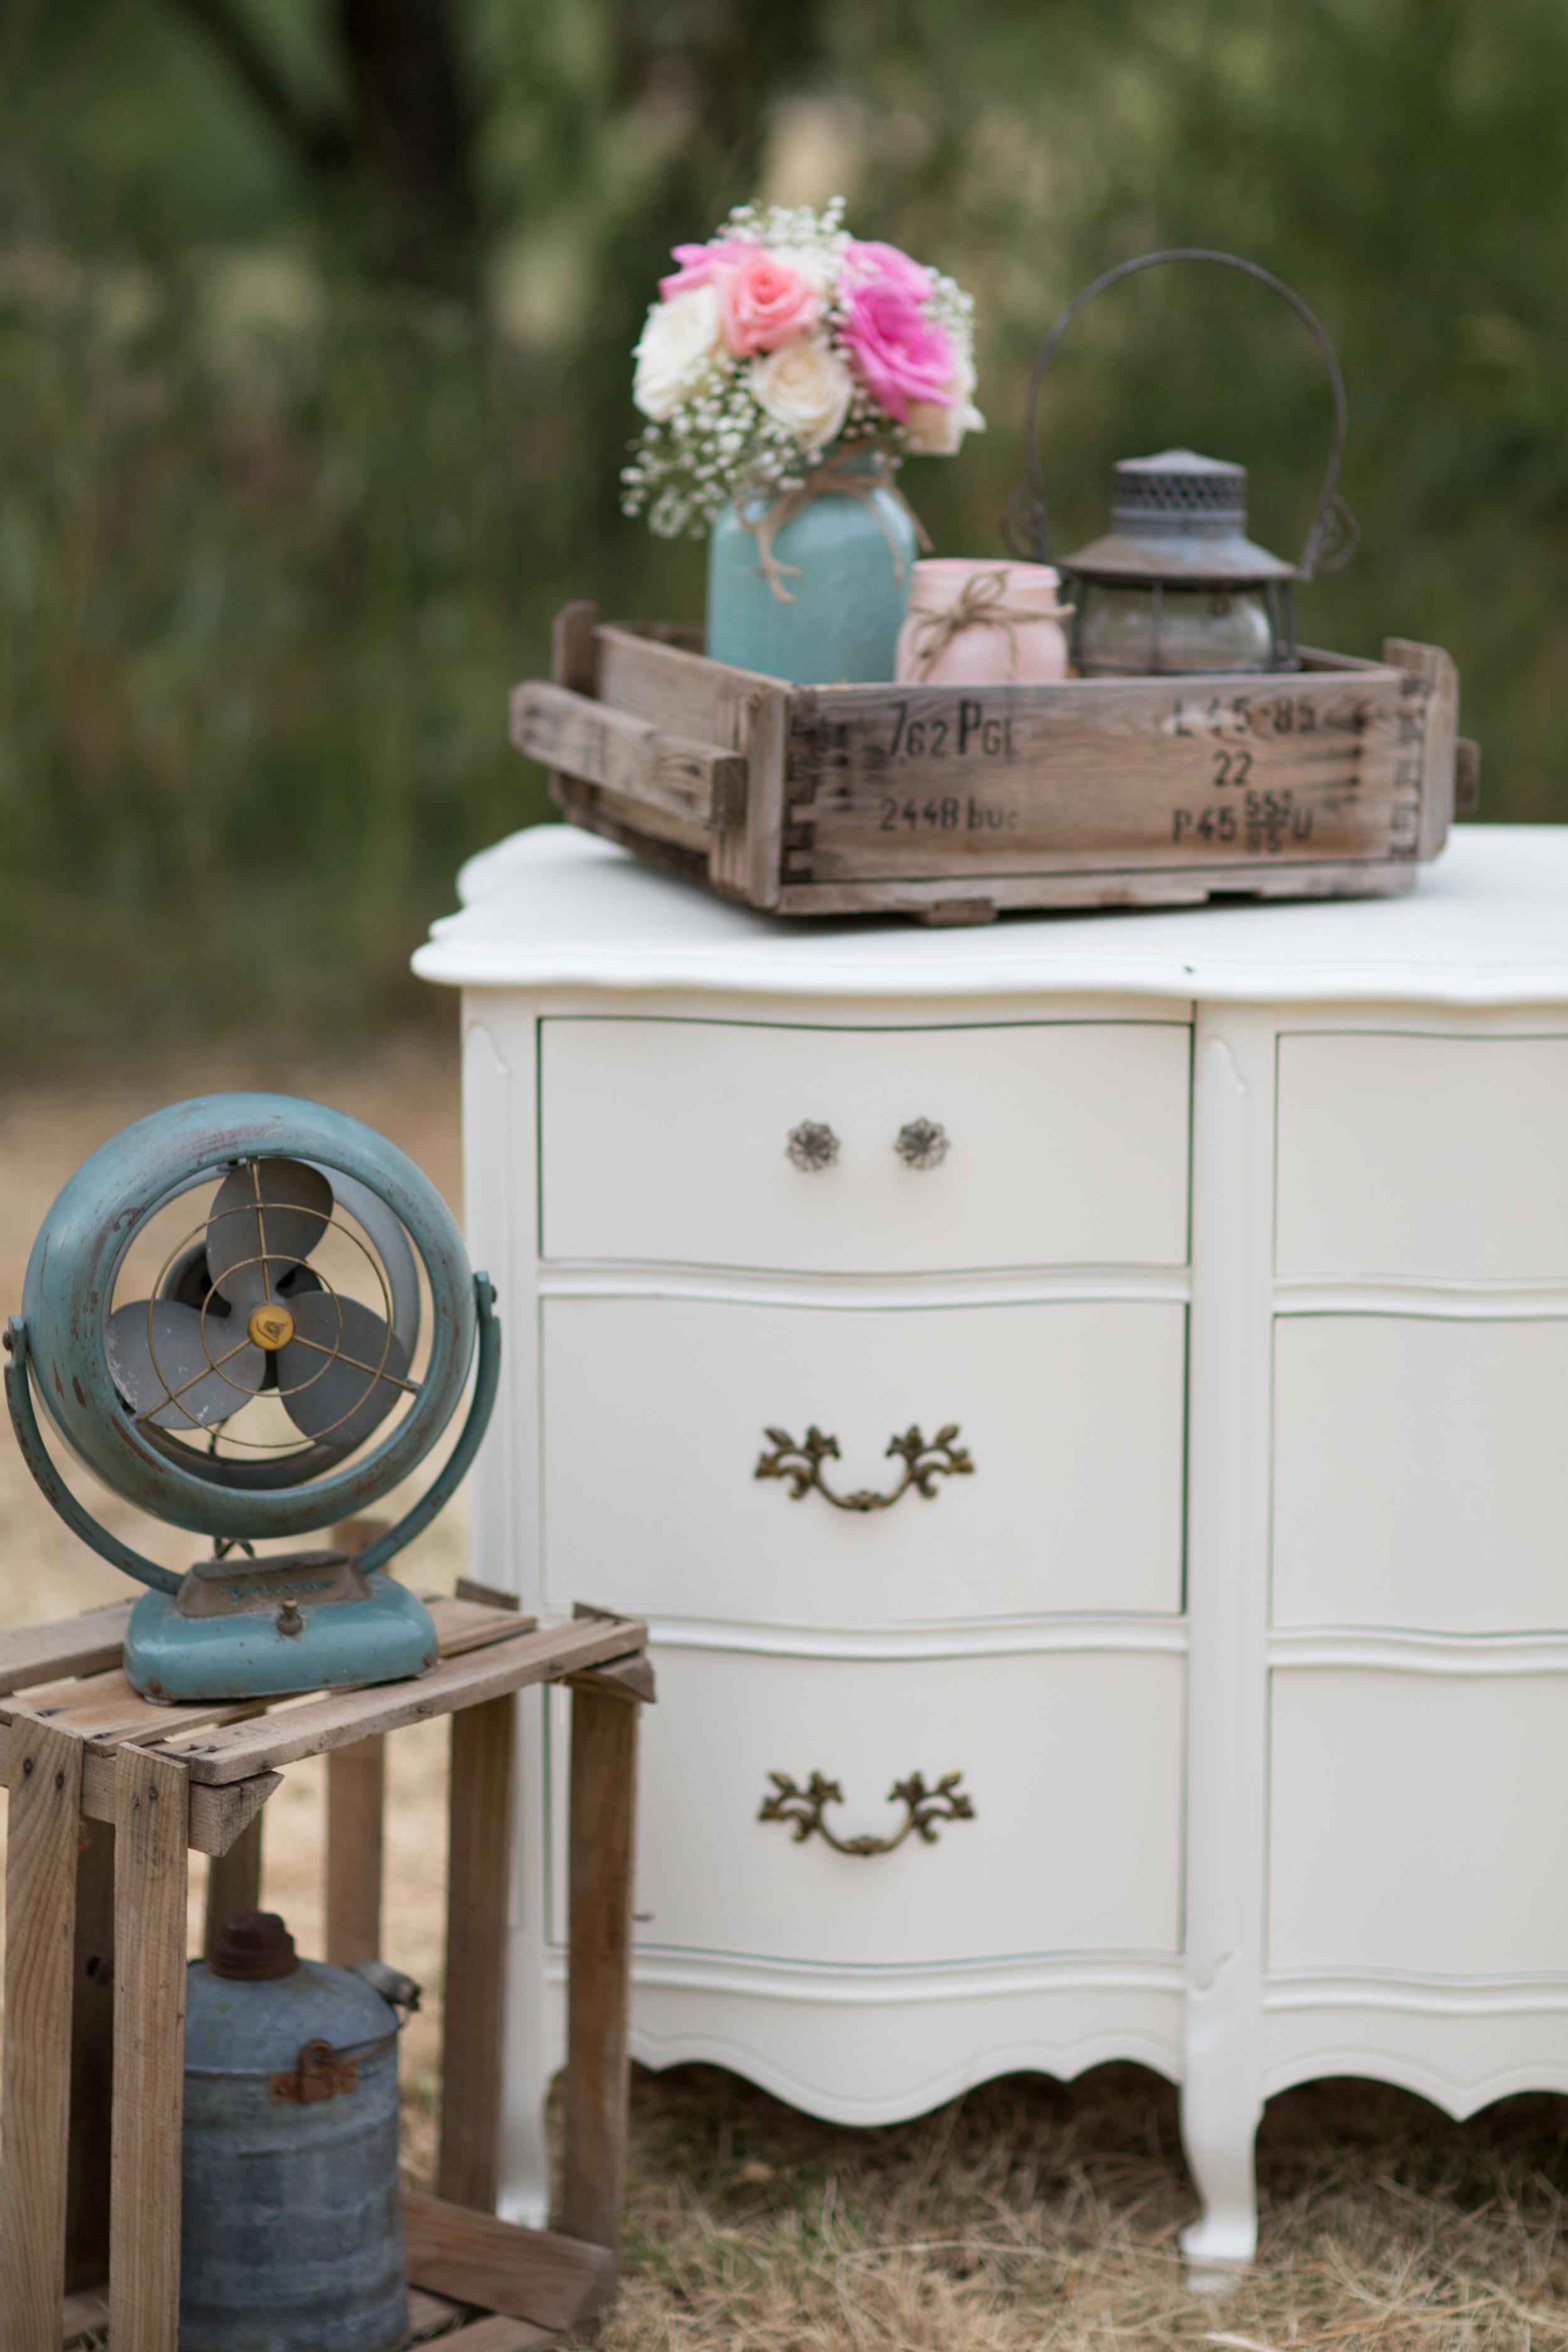 Vintage fan, vintage crate, mason jars